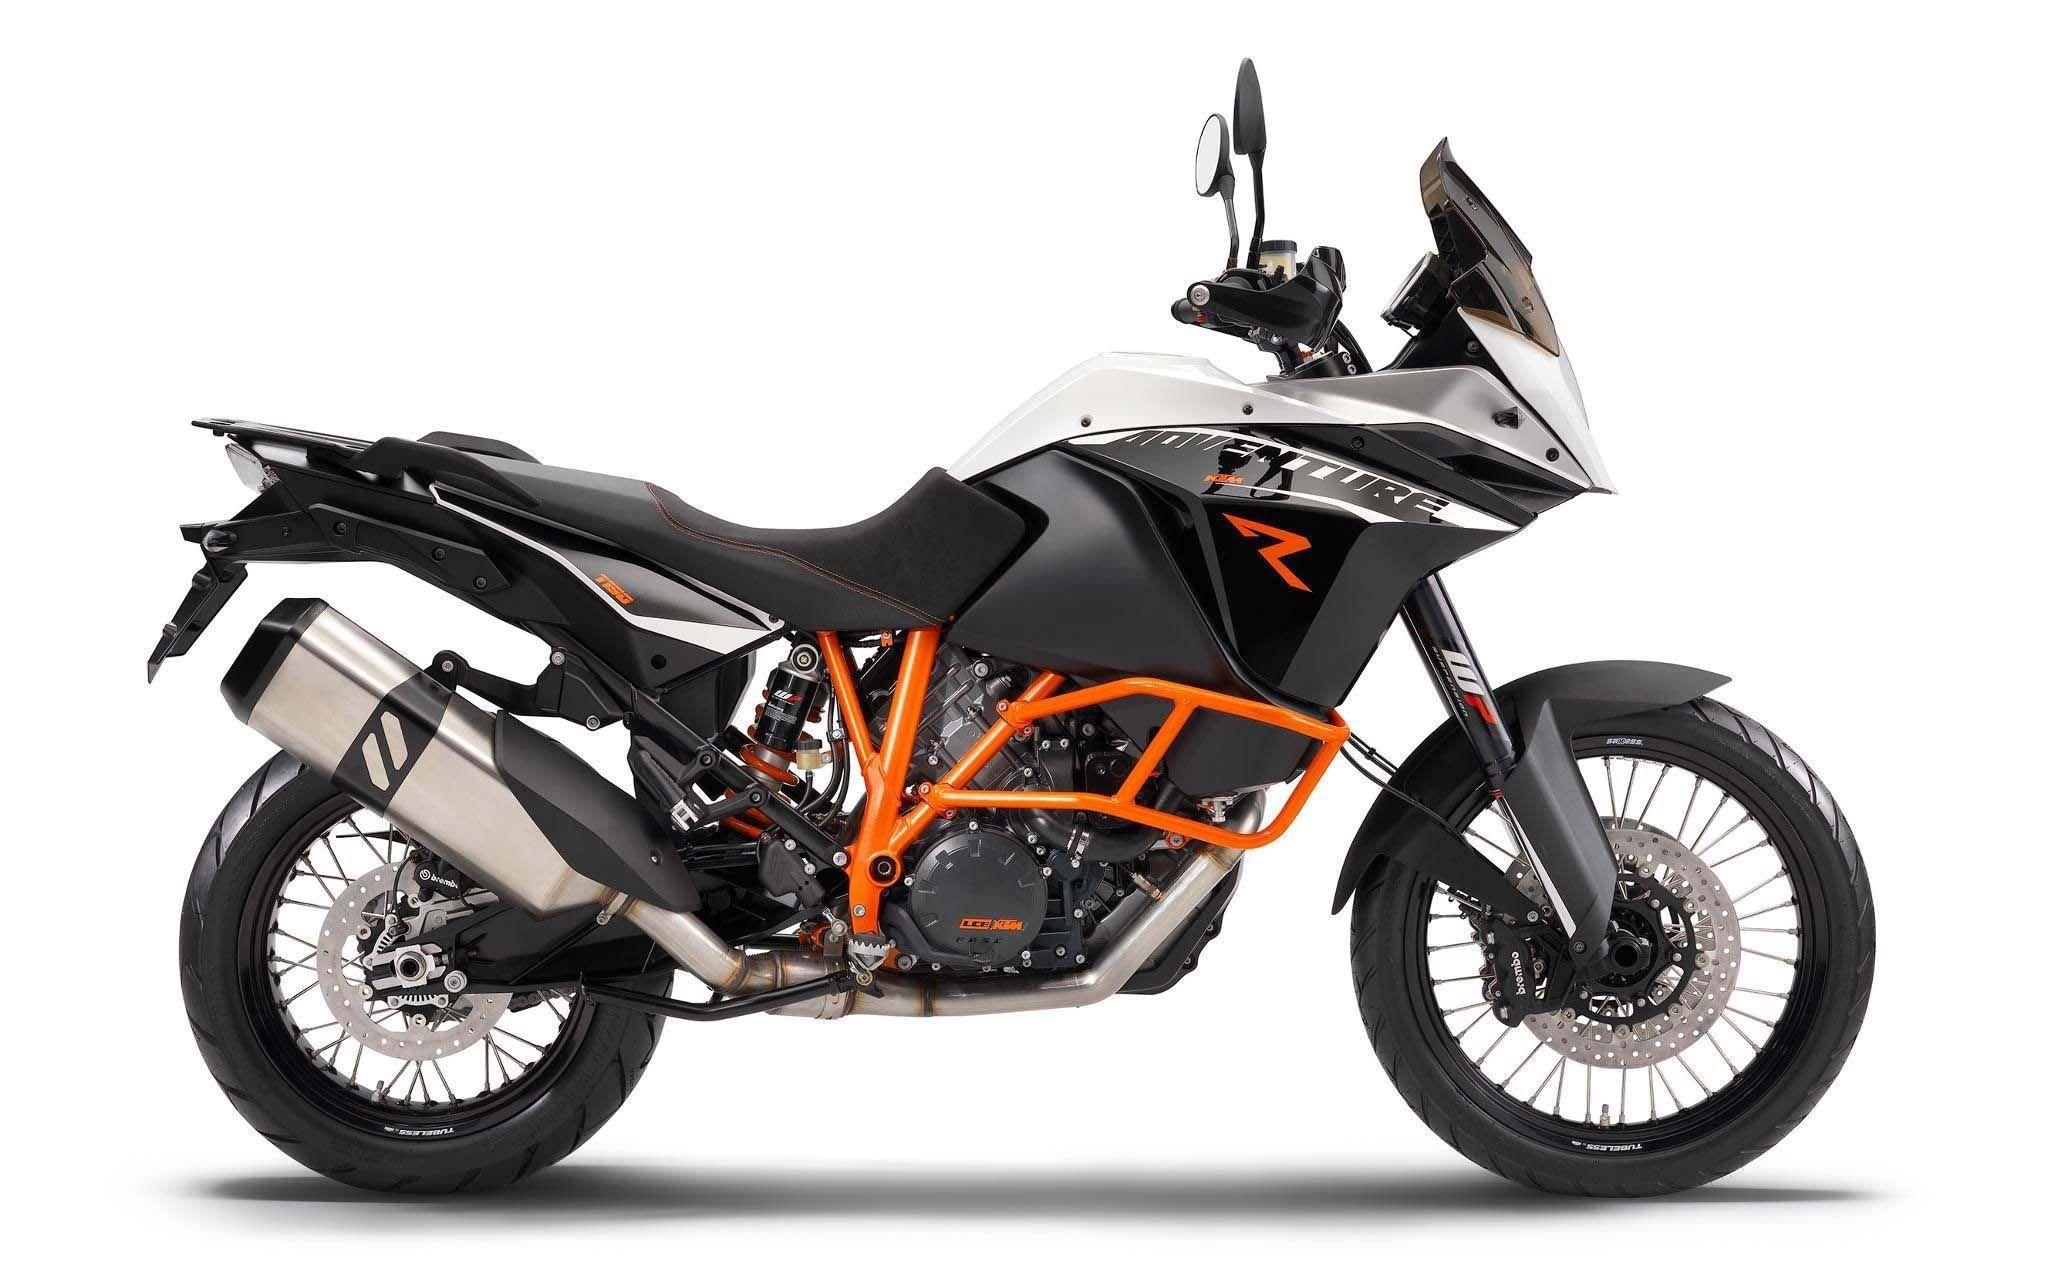 KTM 1190 Adventure R Adventure motorcycle gear, Ktm